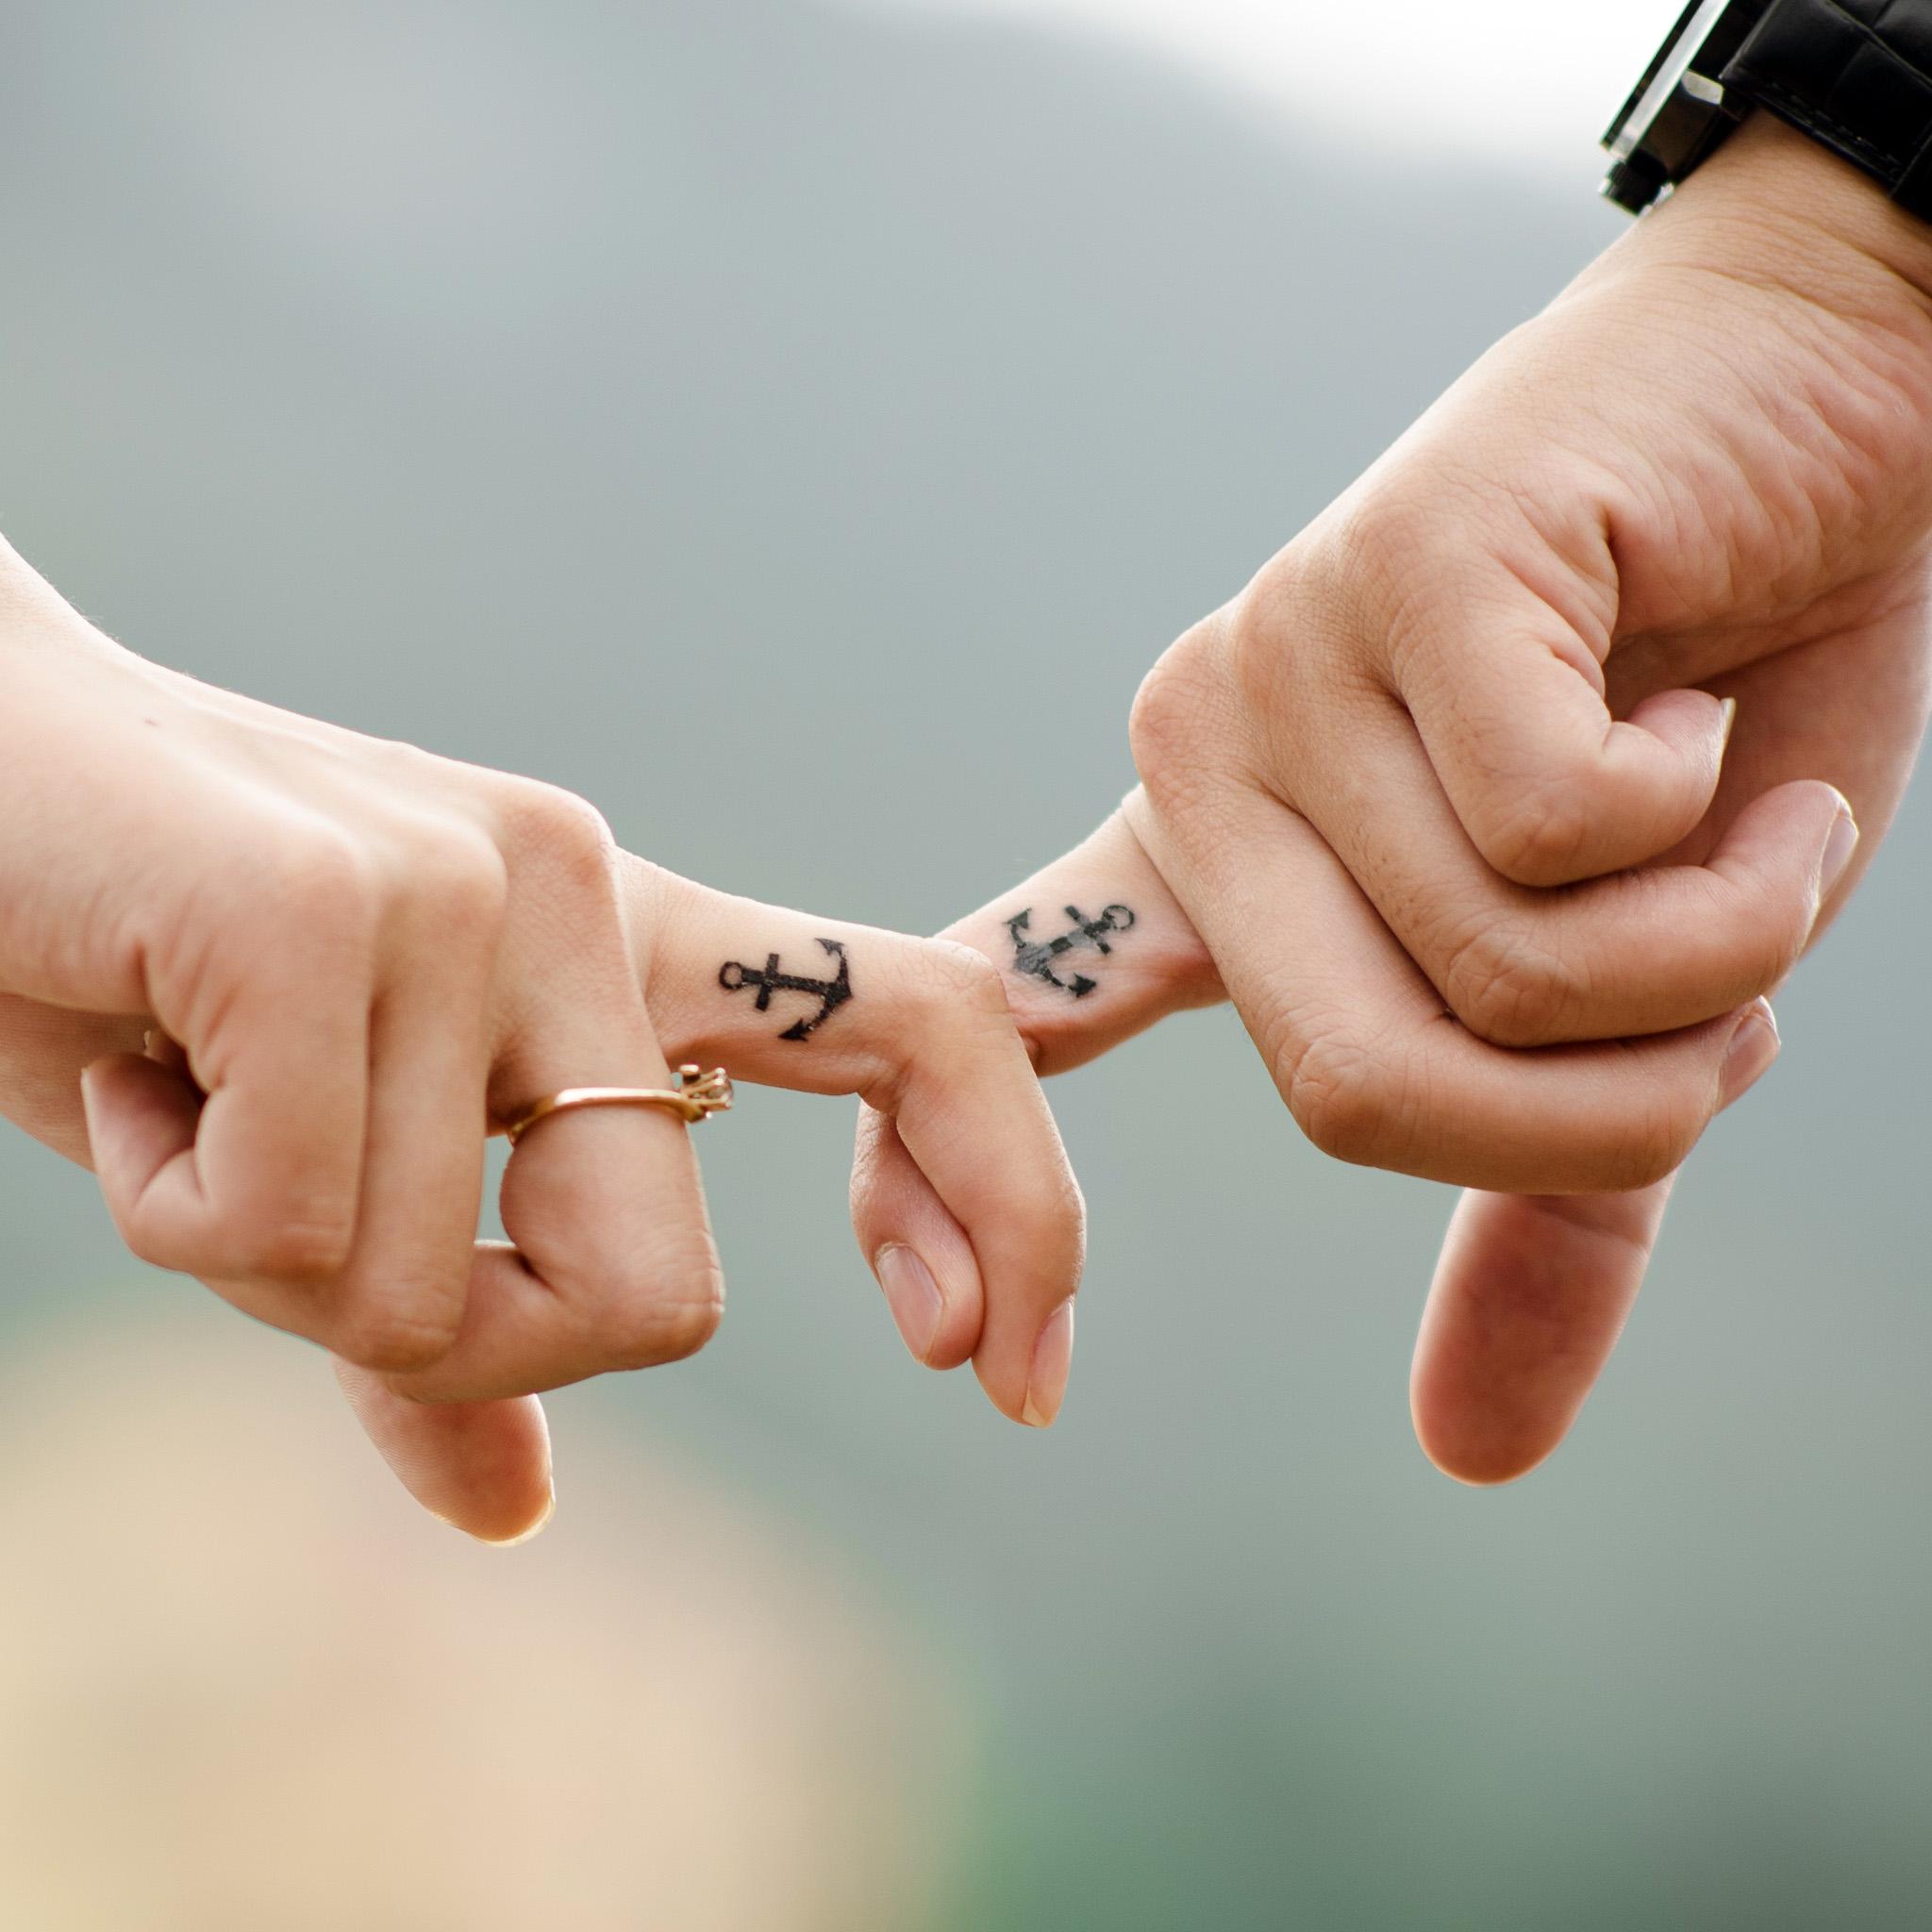 takmeomeo - couple hands ipad wallpaper